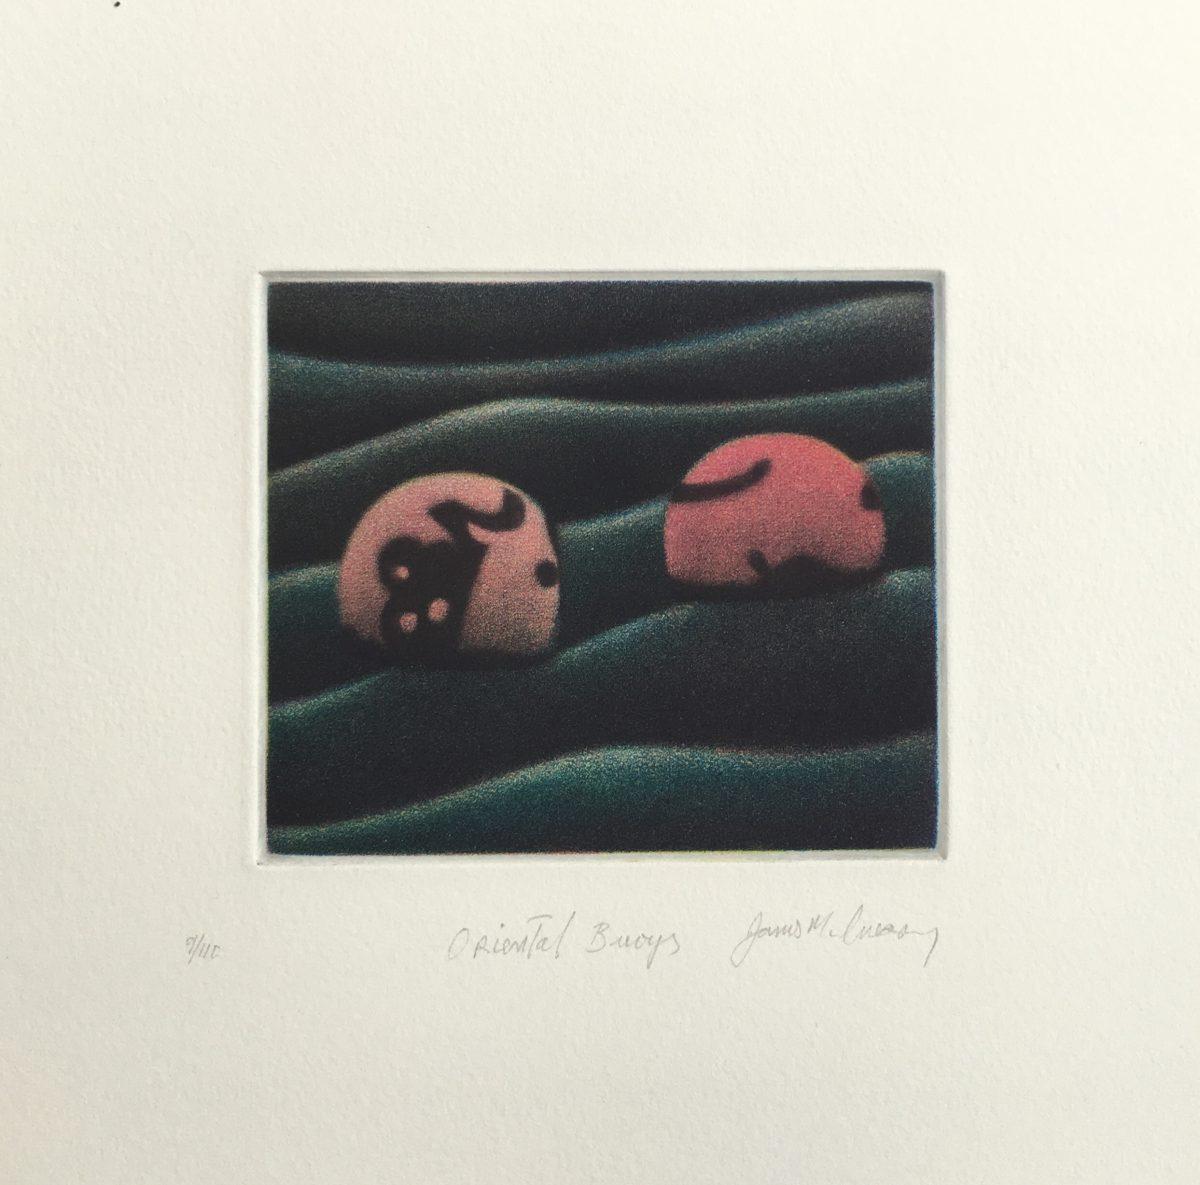 Oriental Buoys, James McCreary